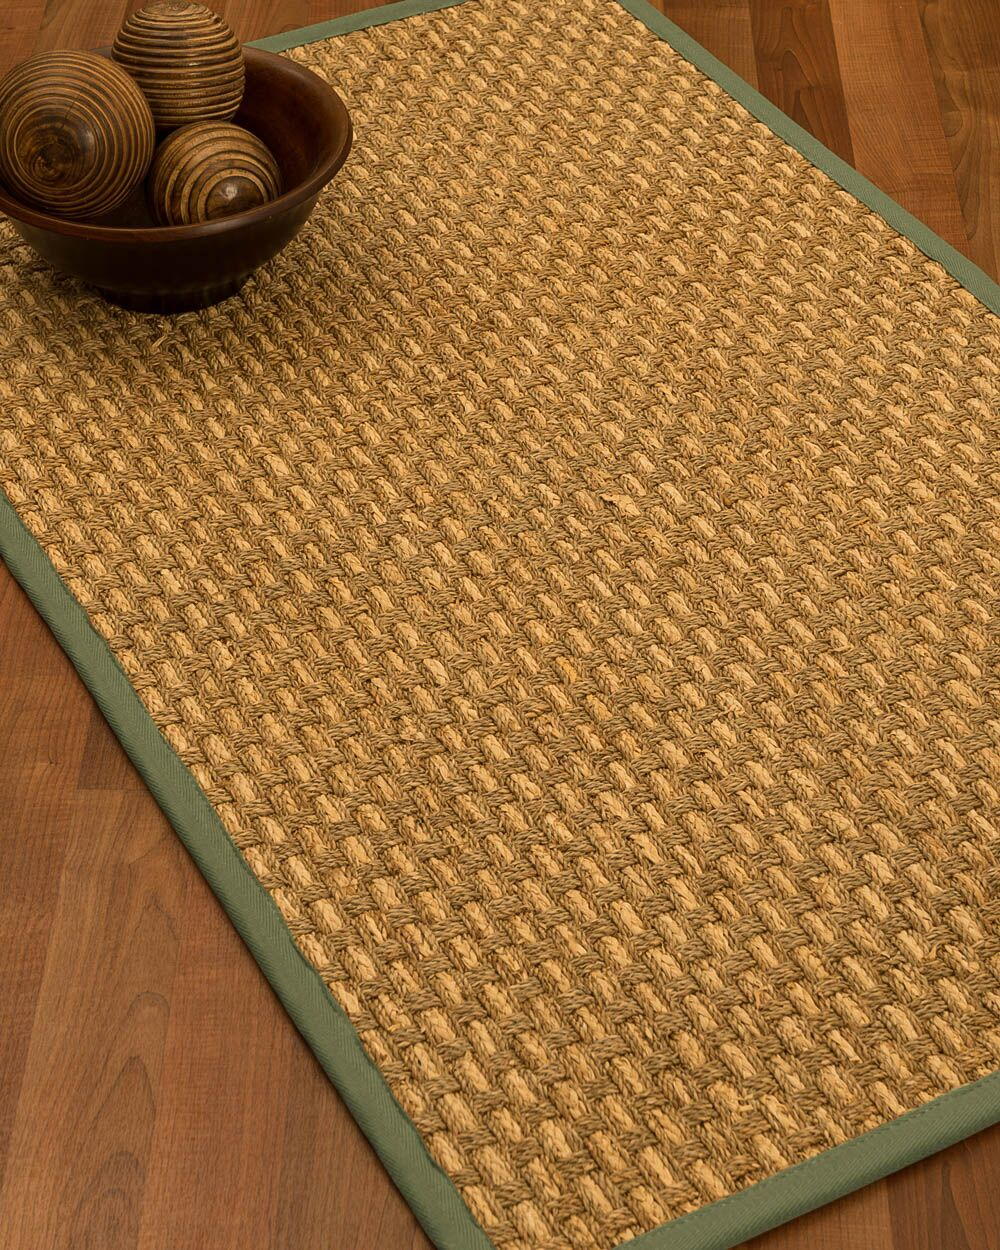 Castiglia Border Hand-Woven Beige/Slate Area Rug Rug Size: Rectangle 4' x 6', Rug Pad Included: Yes